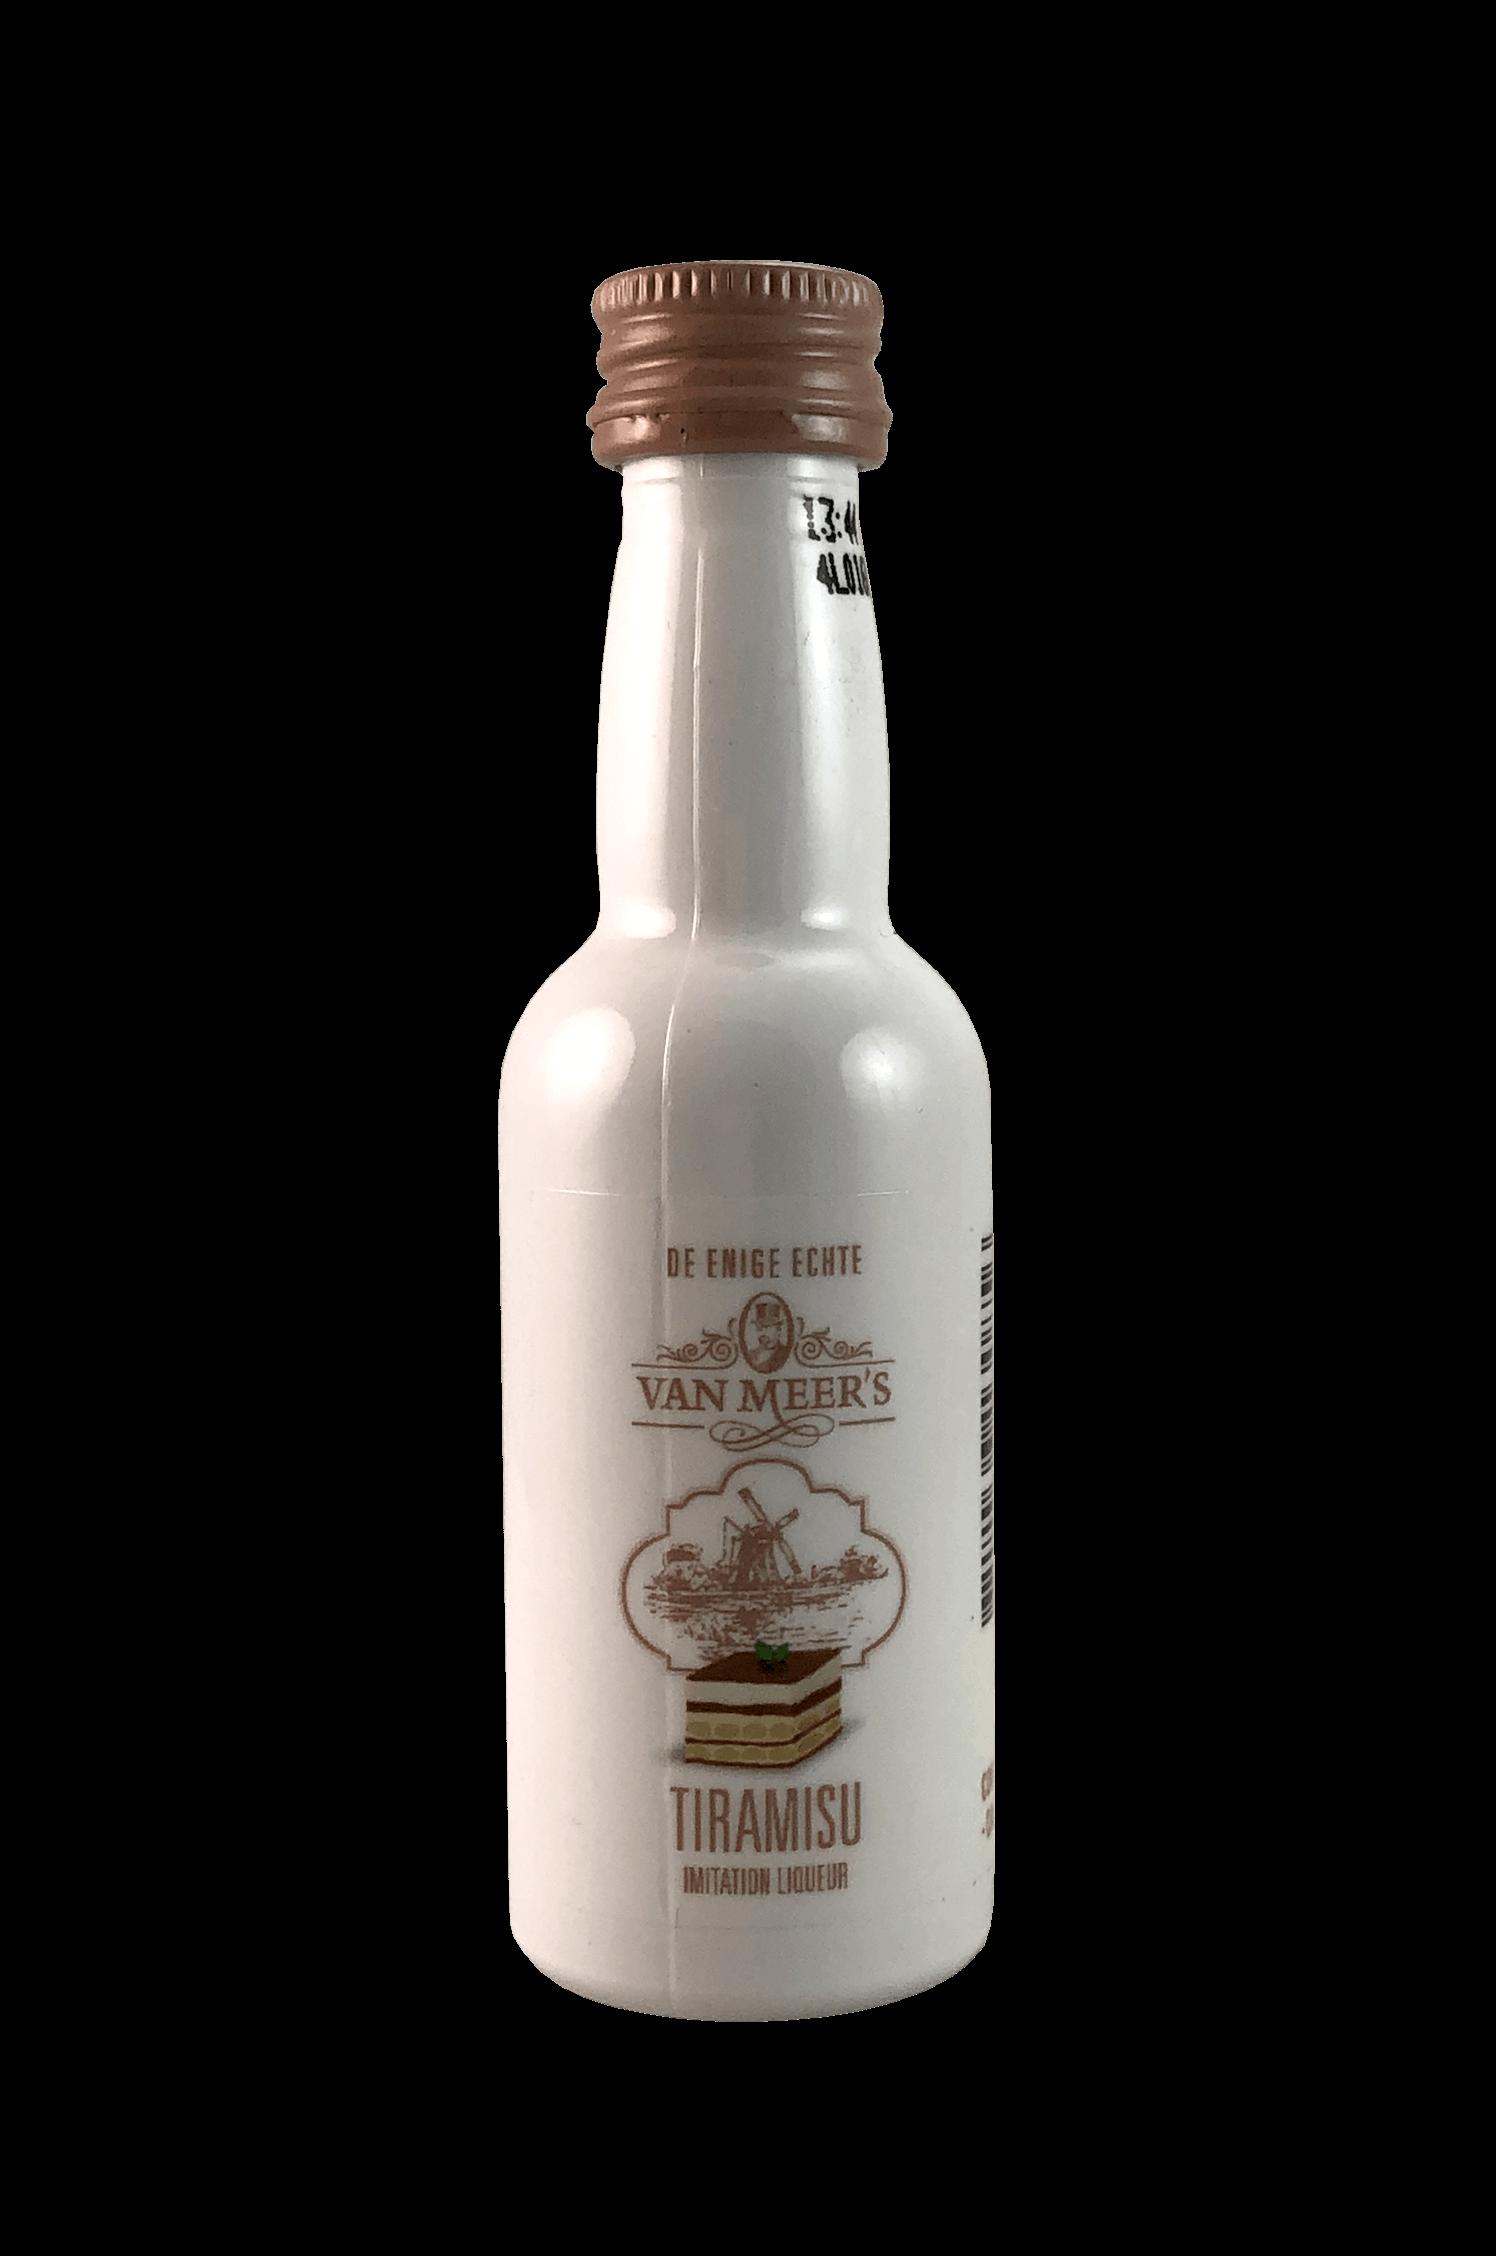 Van Meer's Tiramisu Liqueur